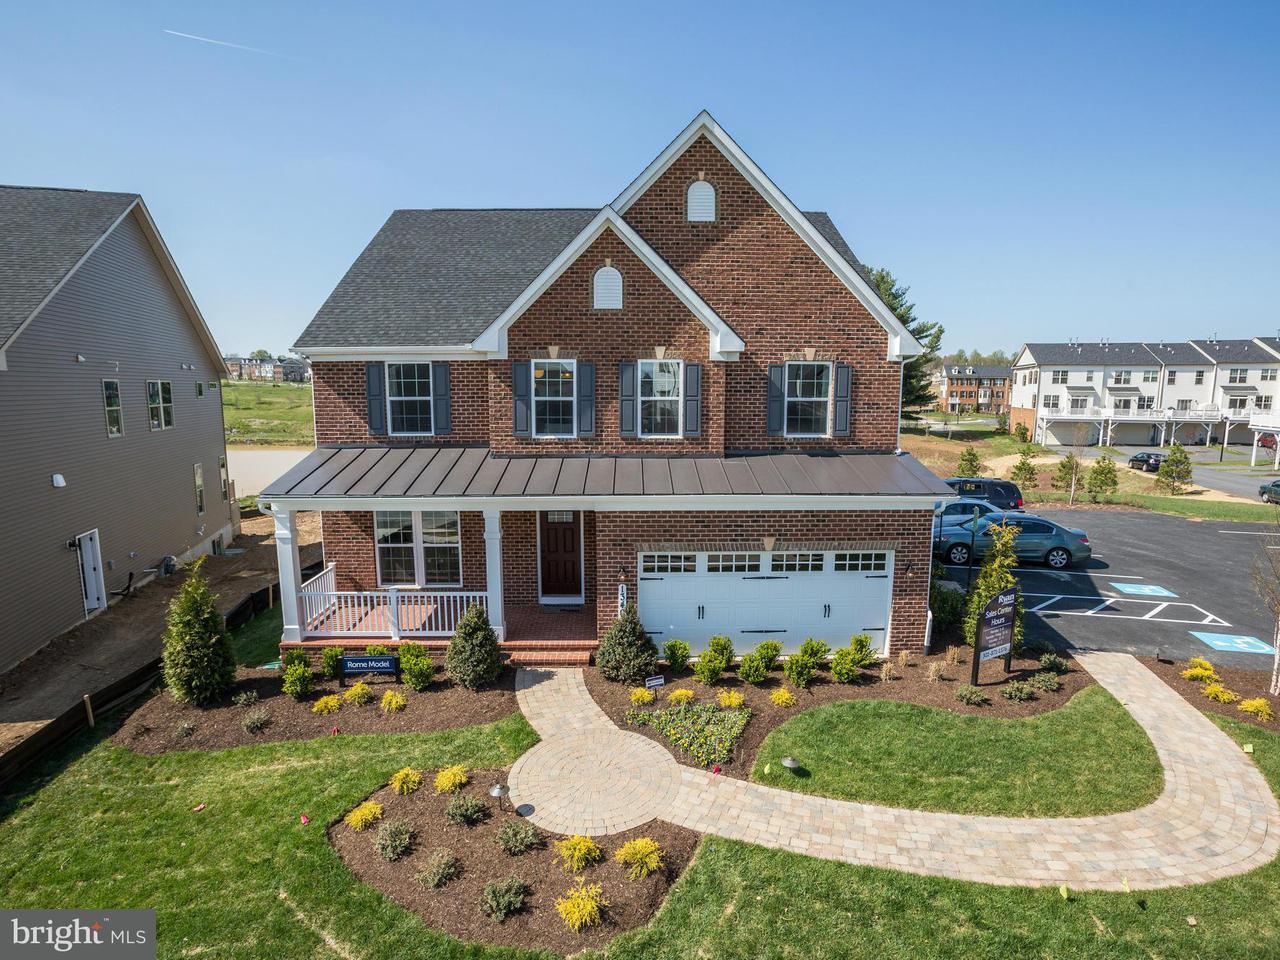 Single Family Home for Sale at 1032 Guillemot Drive 1032 Guillemot Drive Silver Spring, Maryland 20906 United States